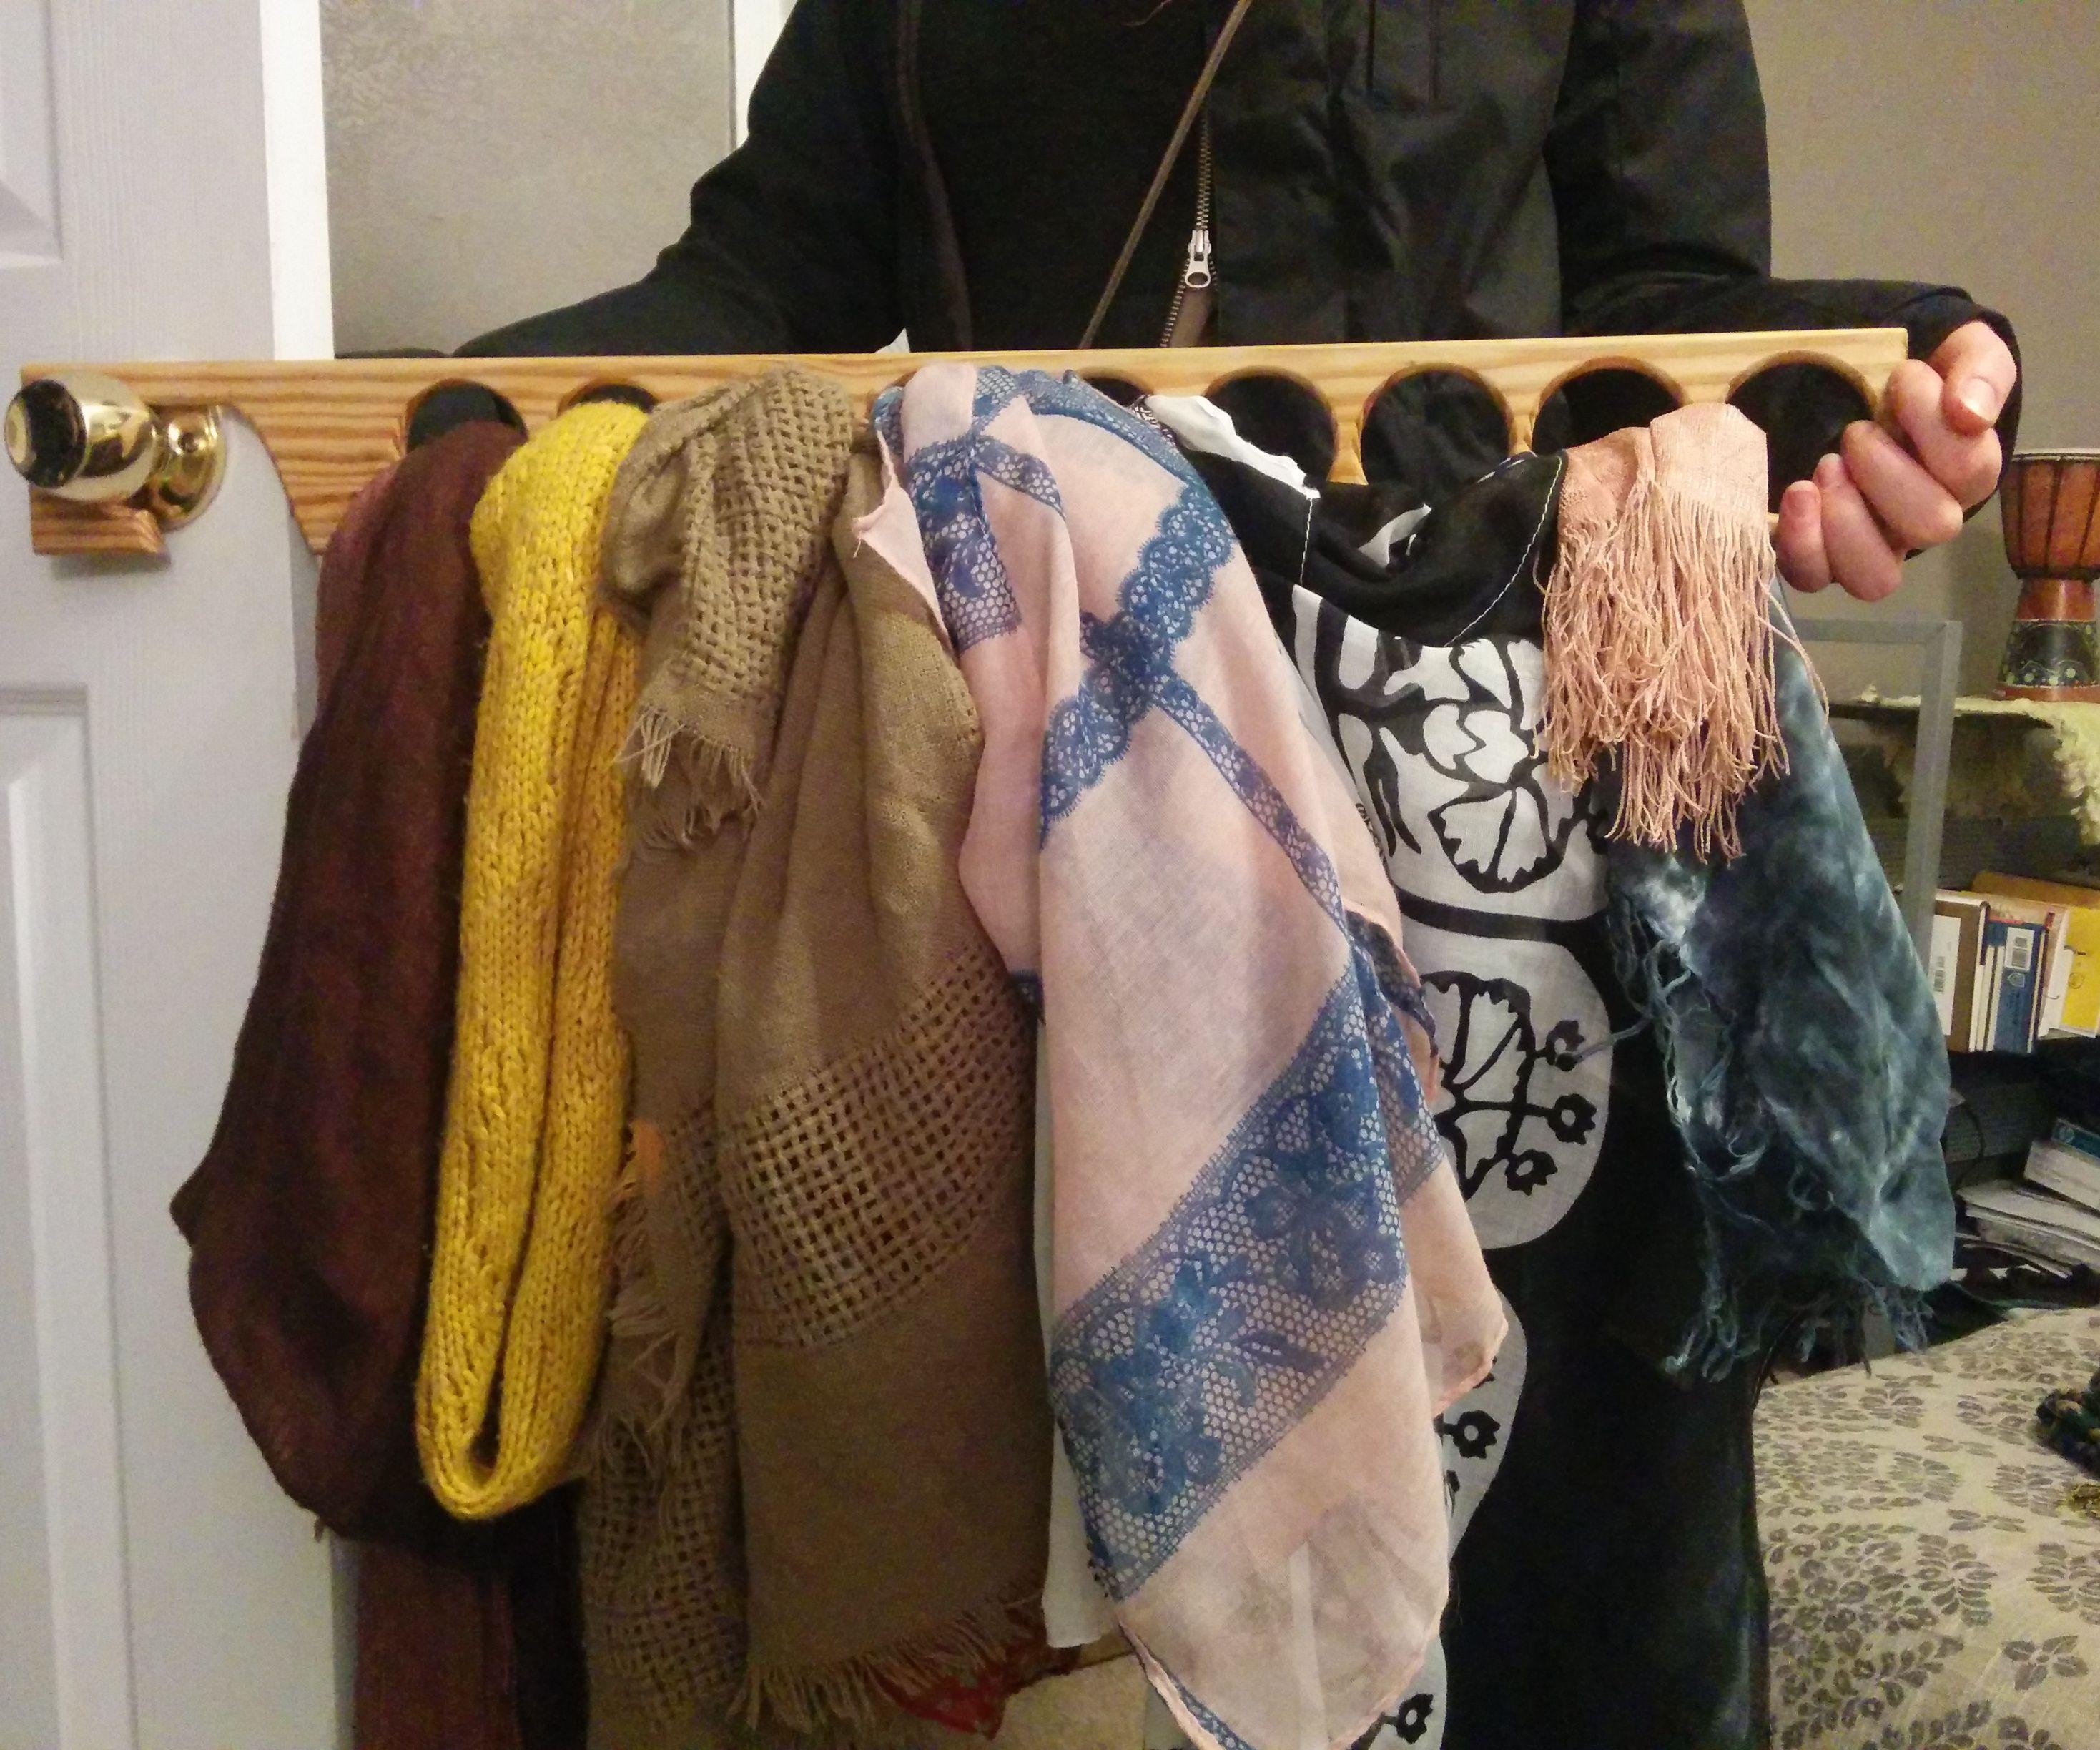 Vertical Scarf and Necktie Hanger